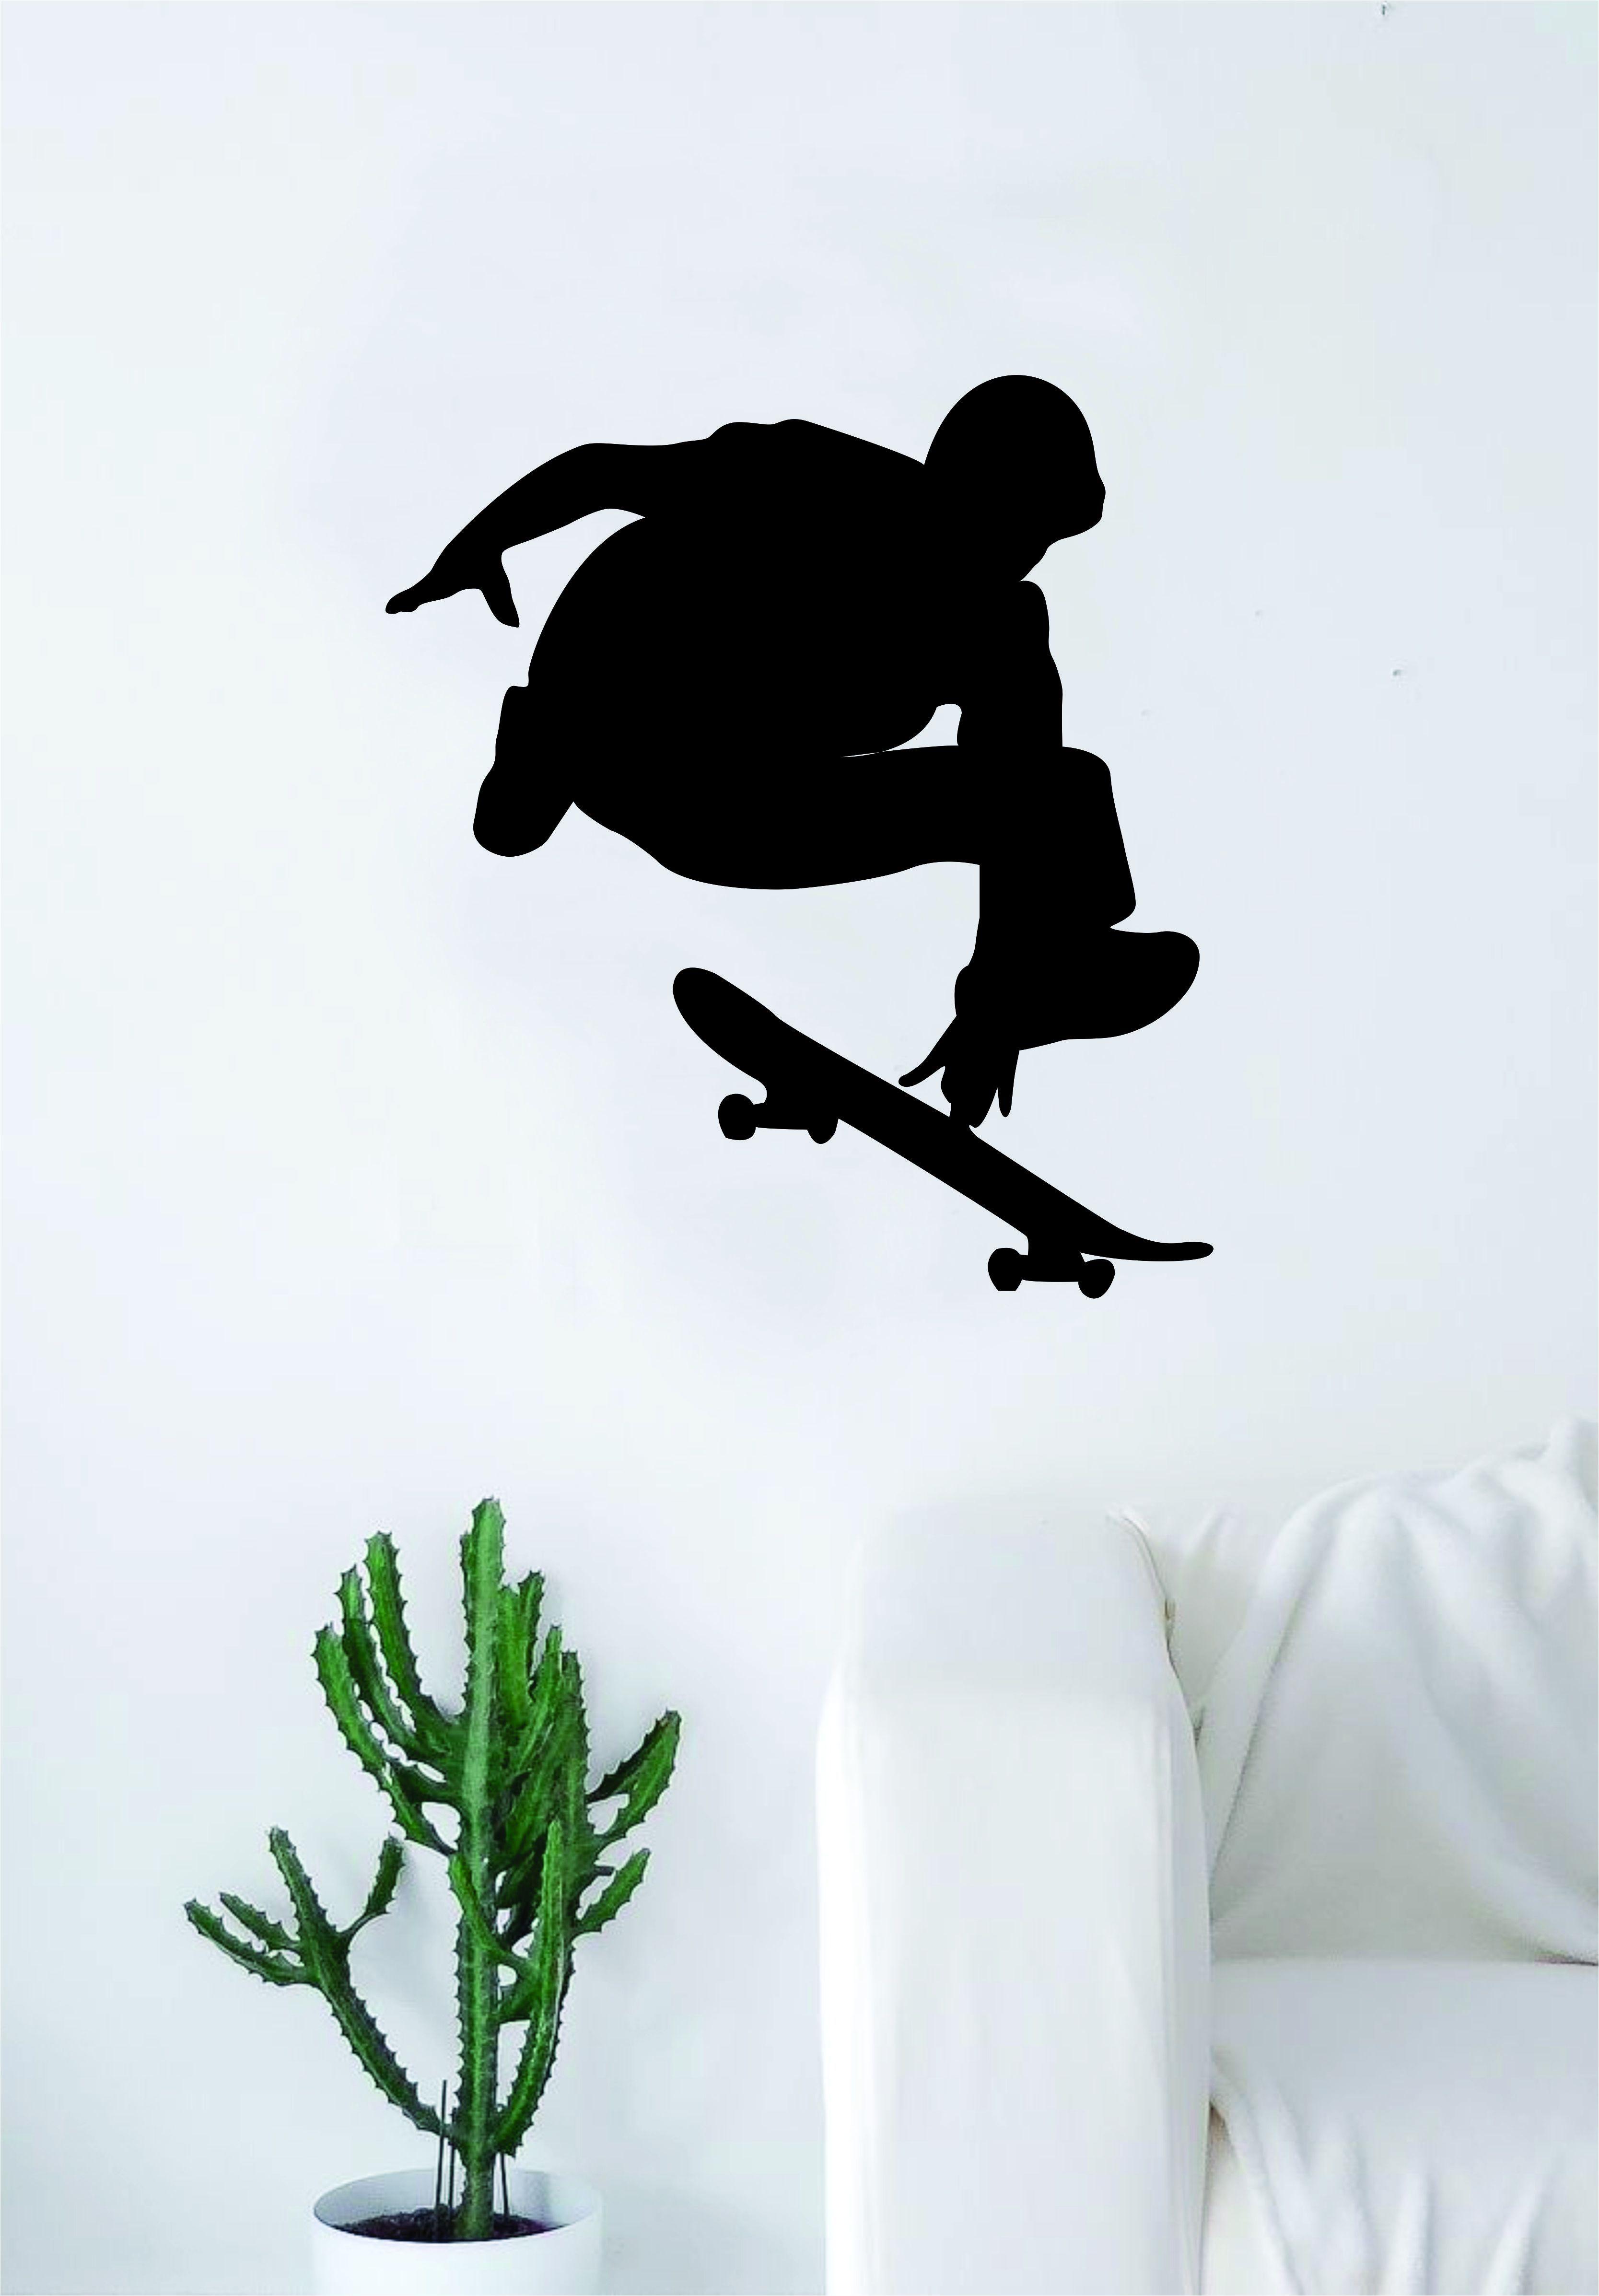 Skater v1 silhouette wall decal sticker bedroom living room